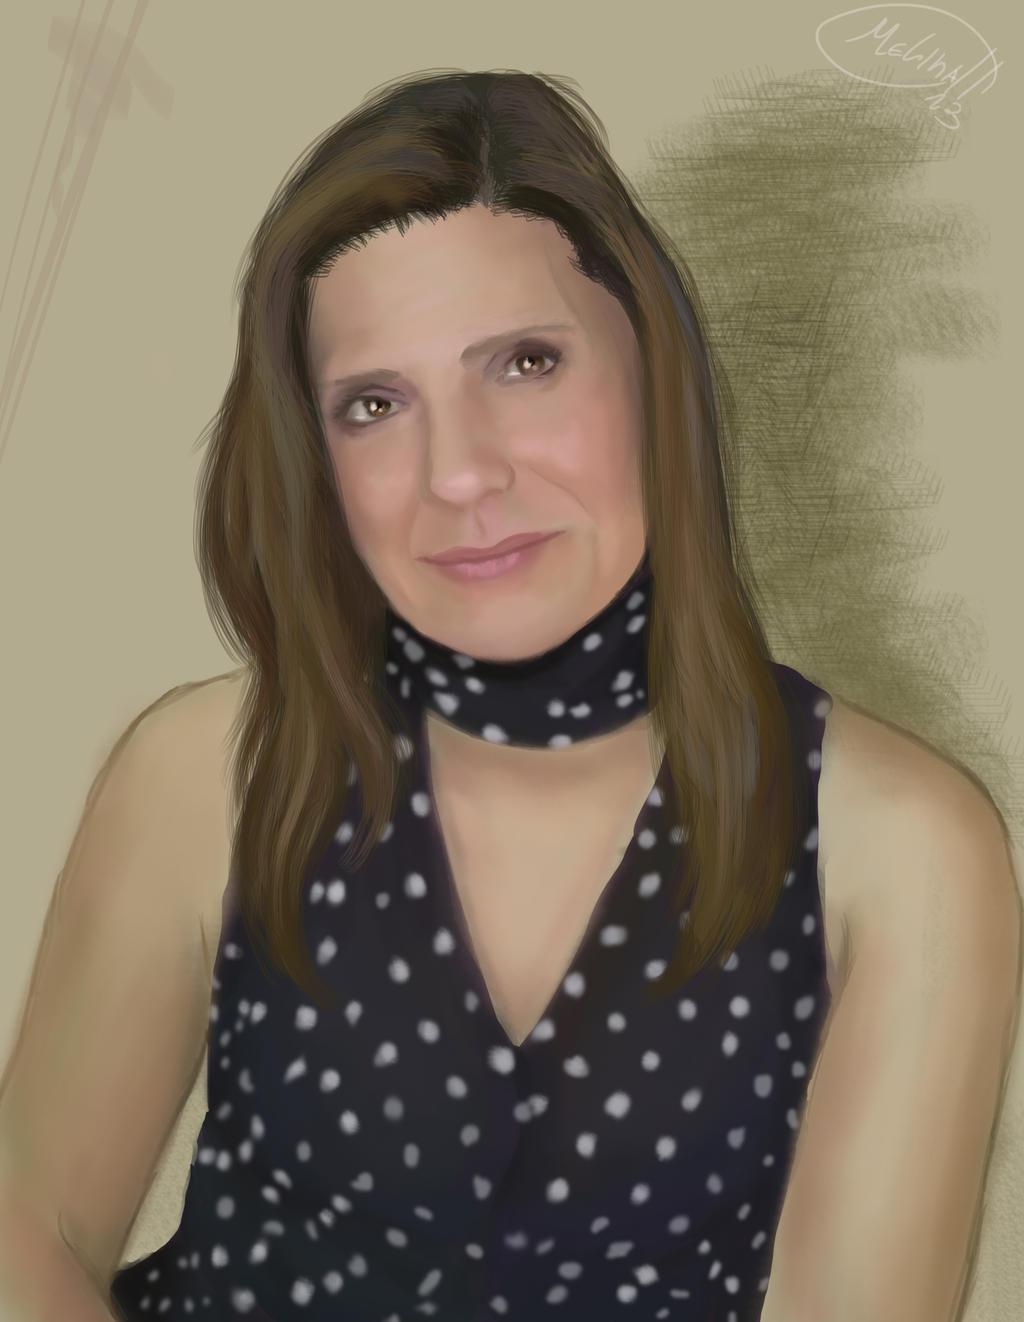 Portrait by MeLiNaHTheMixed